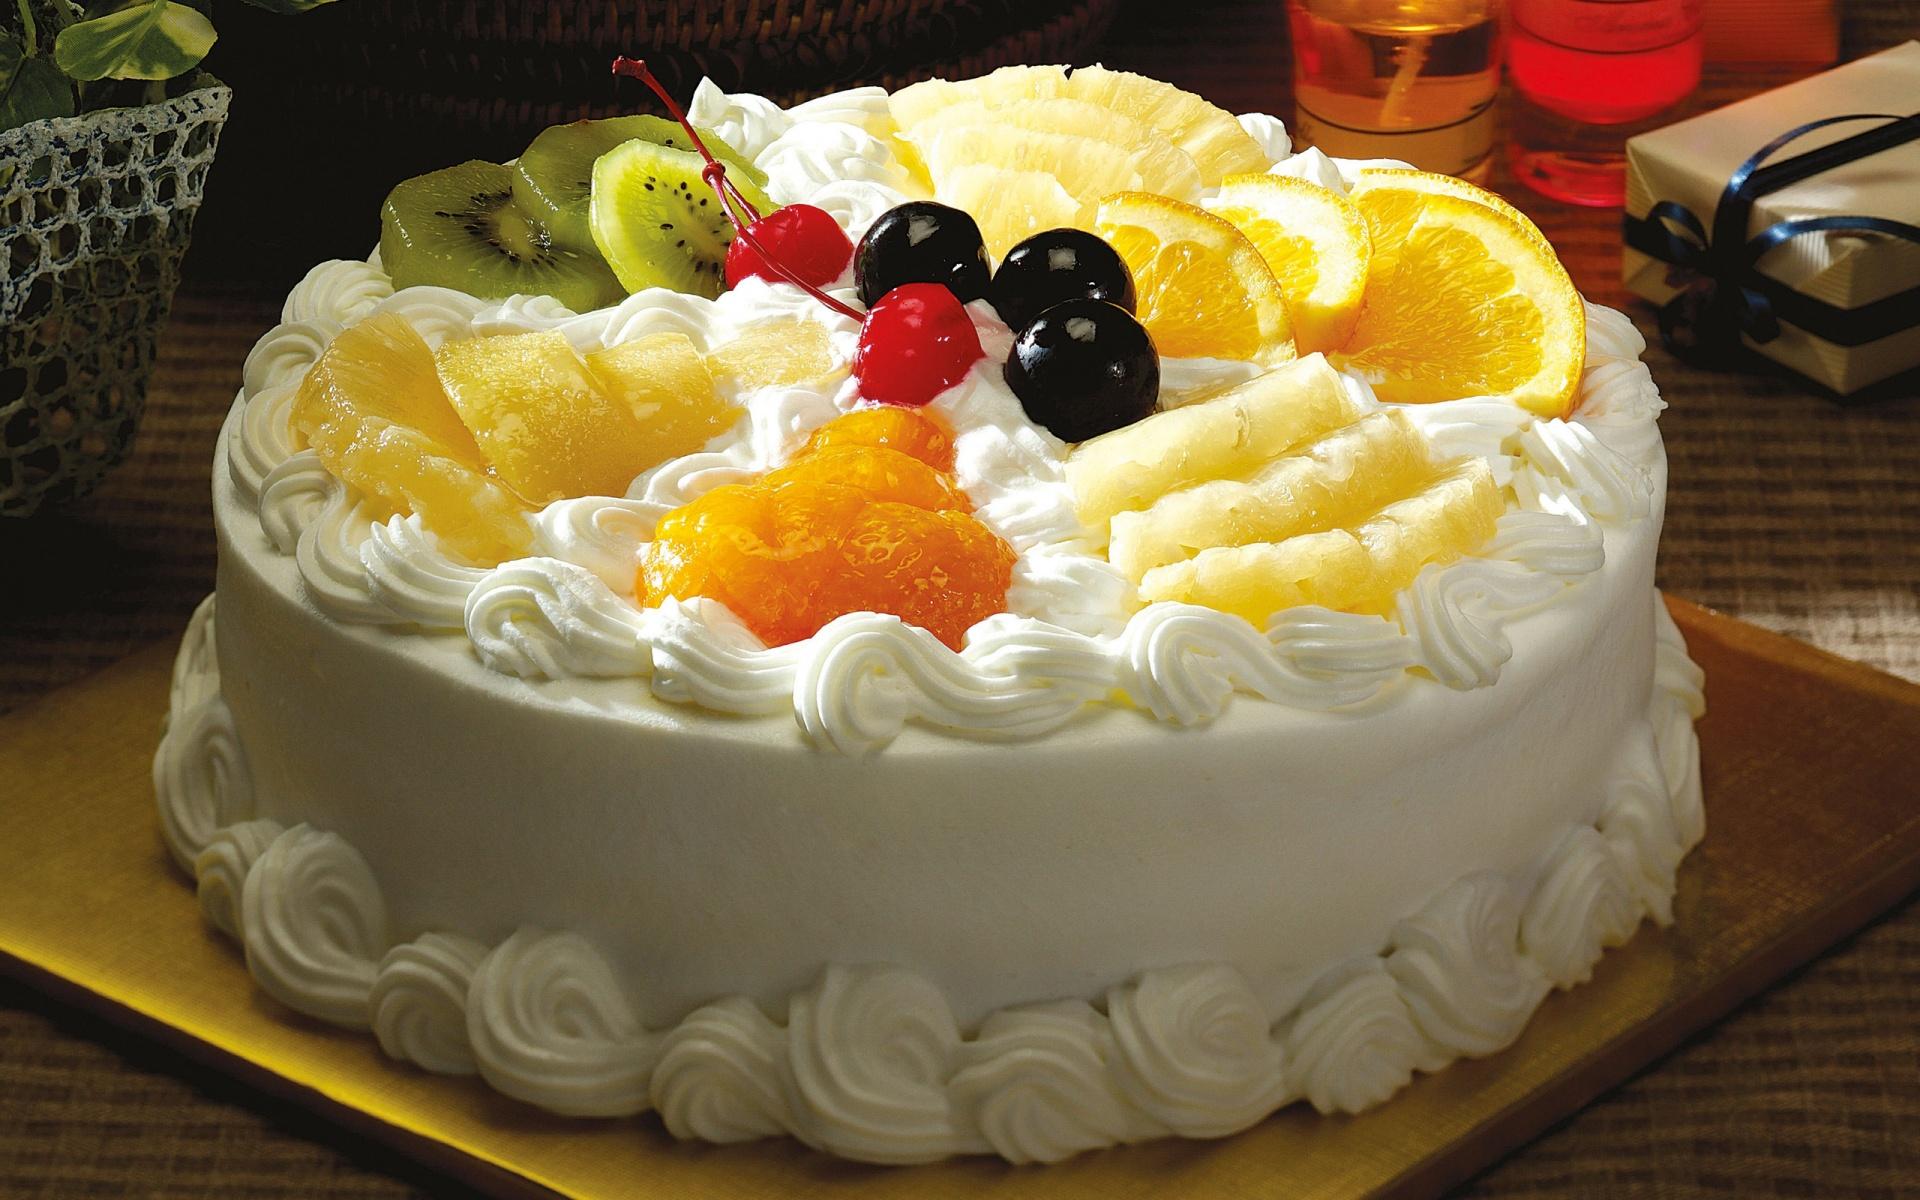 Fruit Creamy Cake